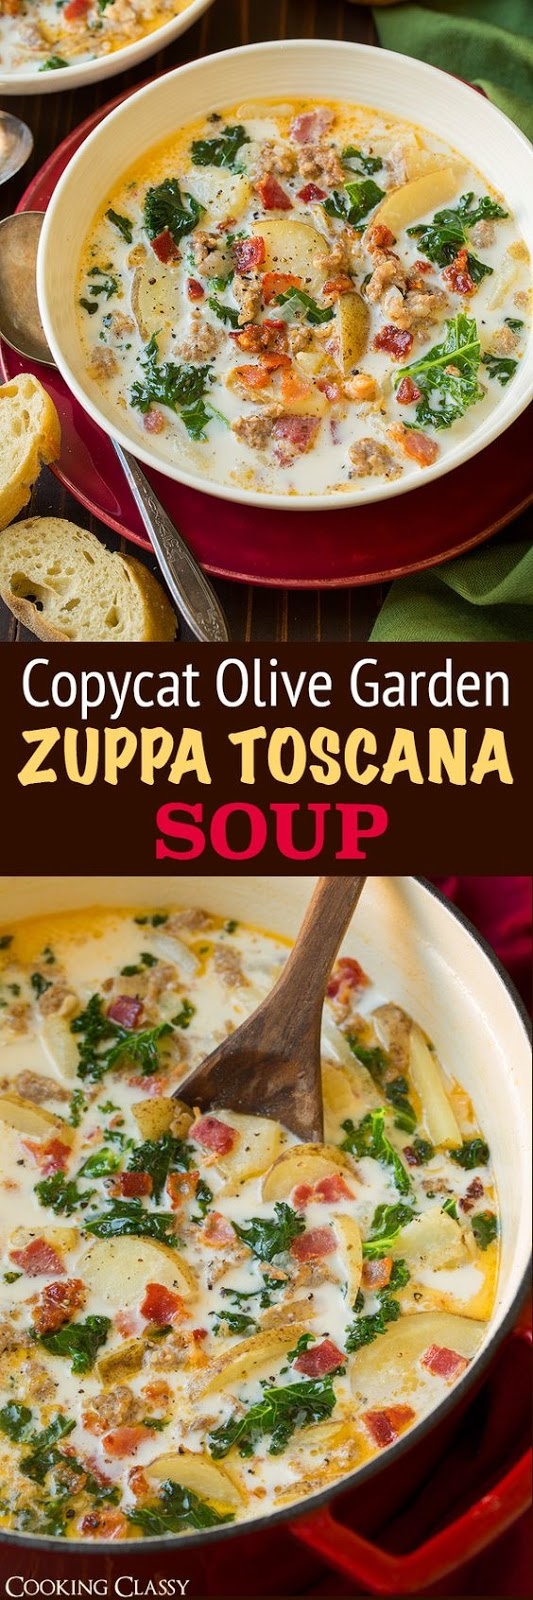 Zuppa toscana soup olive garden copycat cucina de yung for Olive garden copycat zuppa toscana